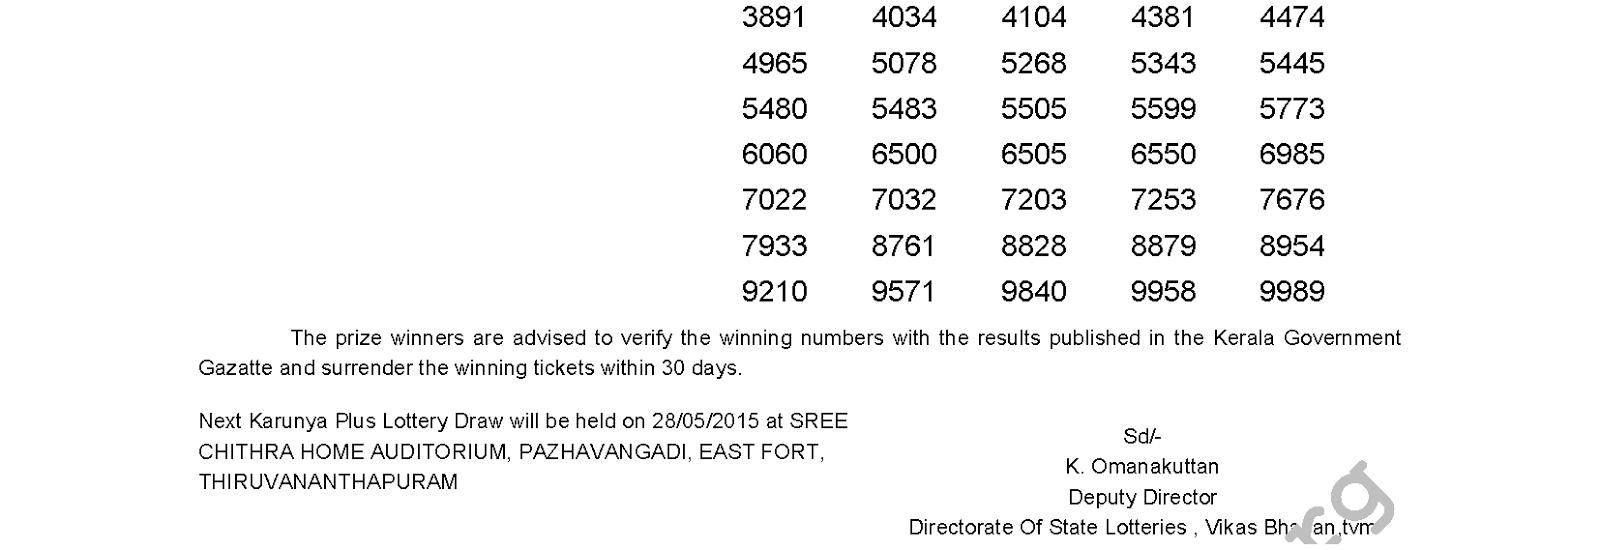 Karunya Plus Lottery KN 58 Result 21-5-2015